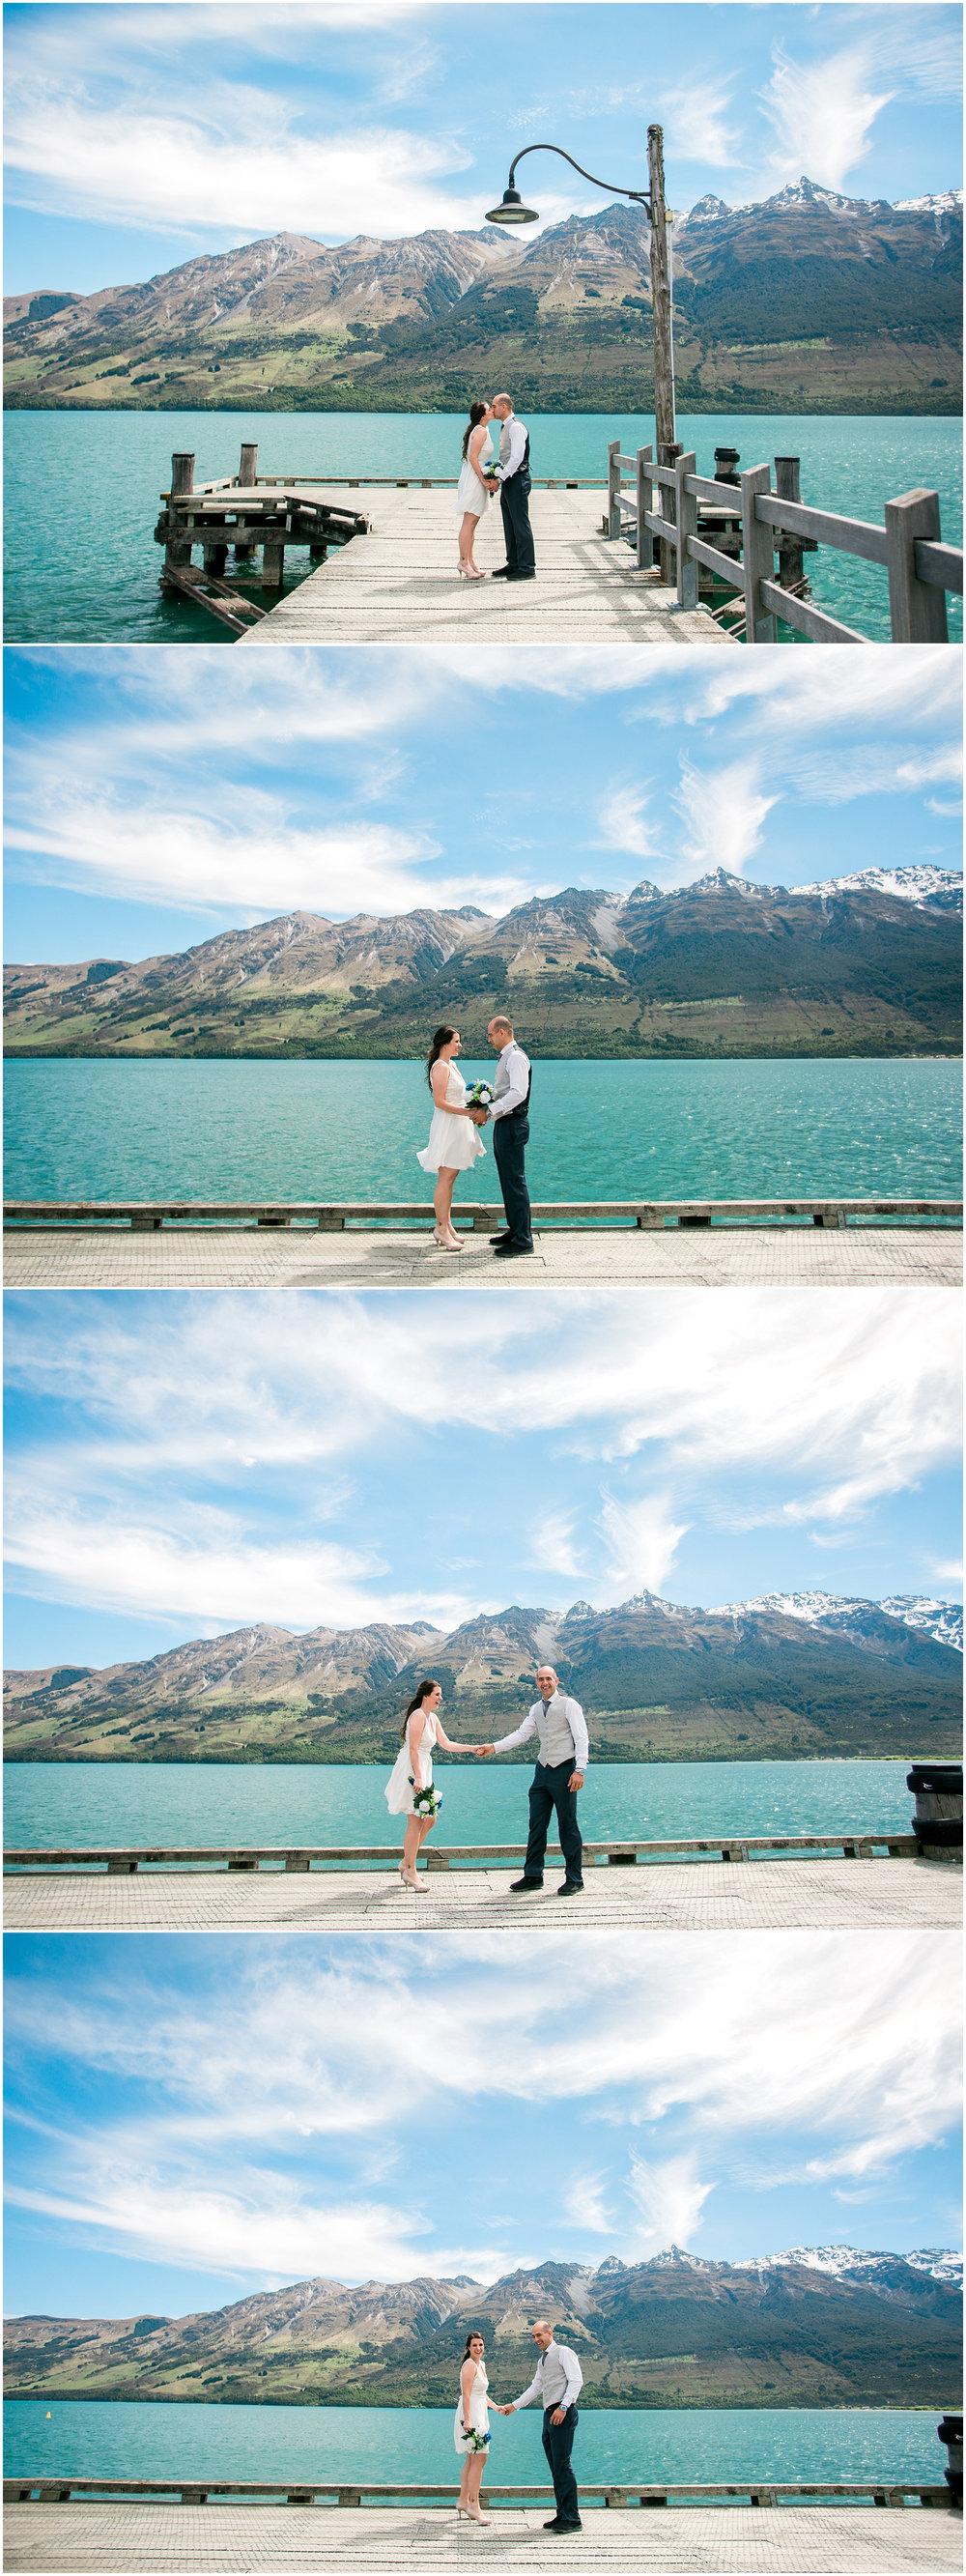 Queenstown New Zealand Wedding Photographer Bruna Fabricio Smetona Photo-0032.jpg